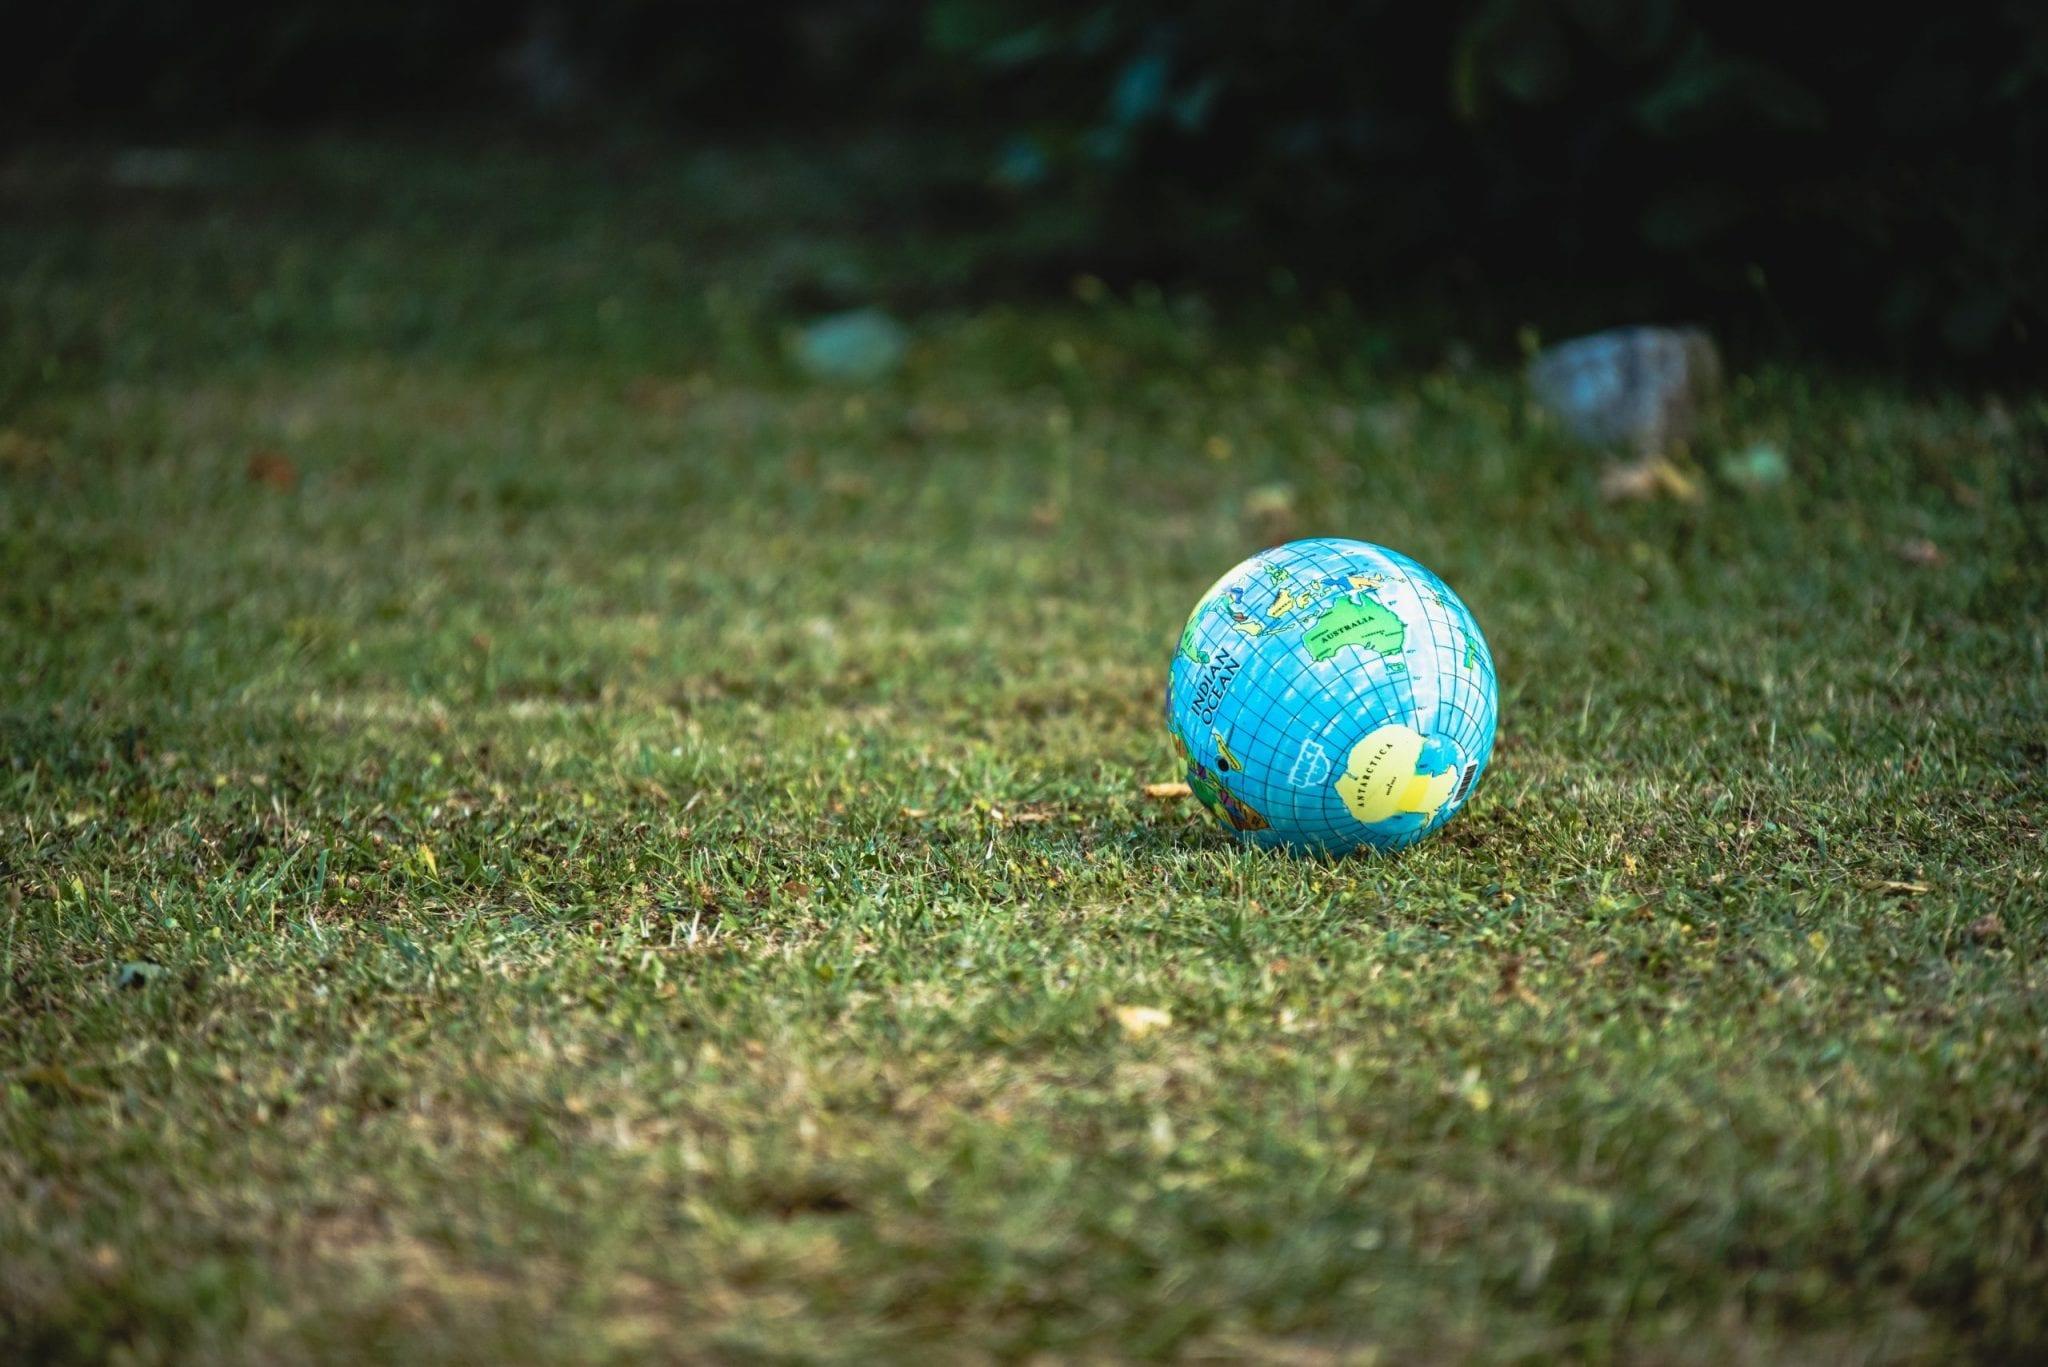 Covid-19 : la pollution diminue, la nature reprend ses droits